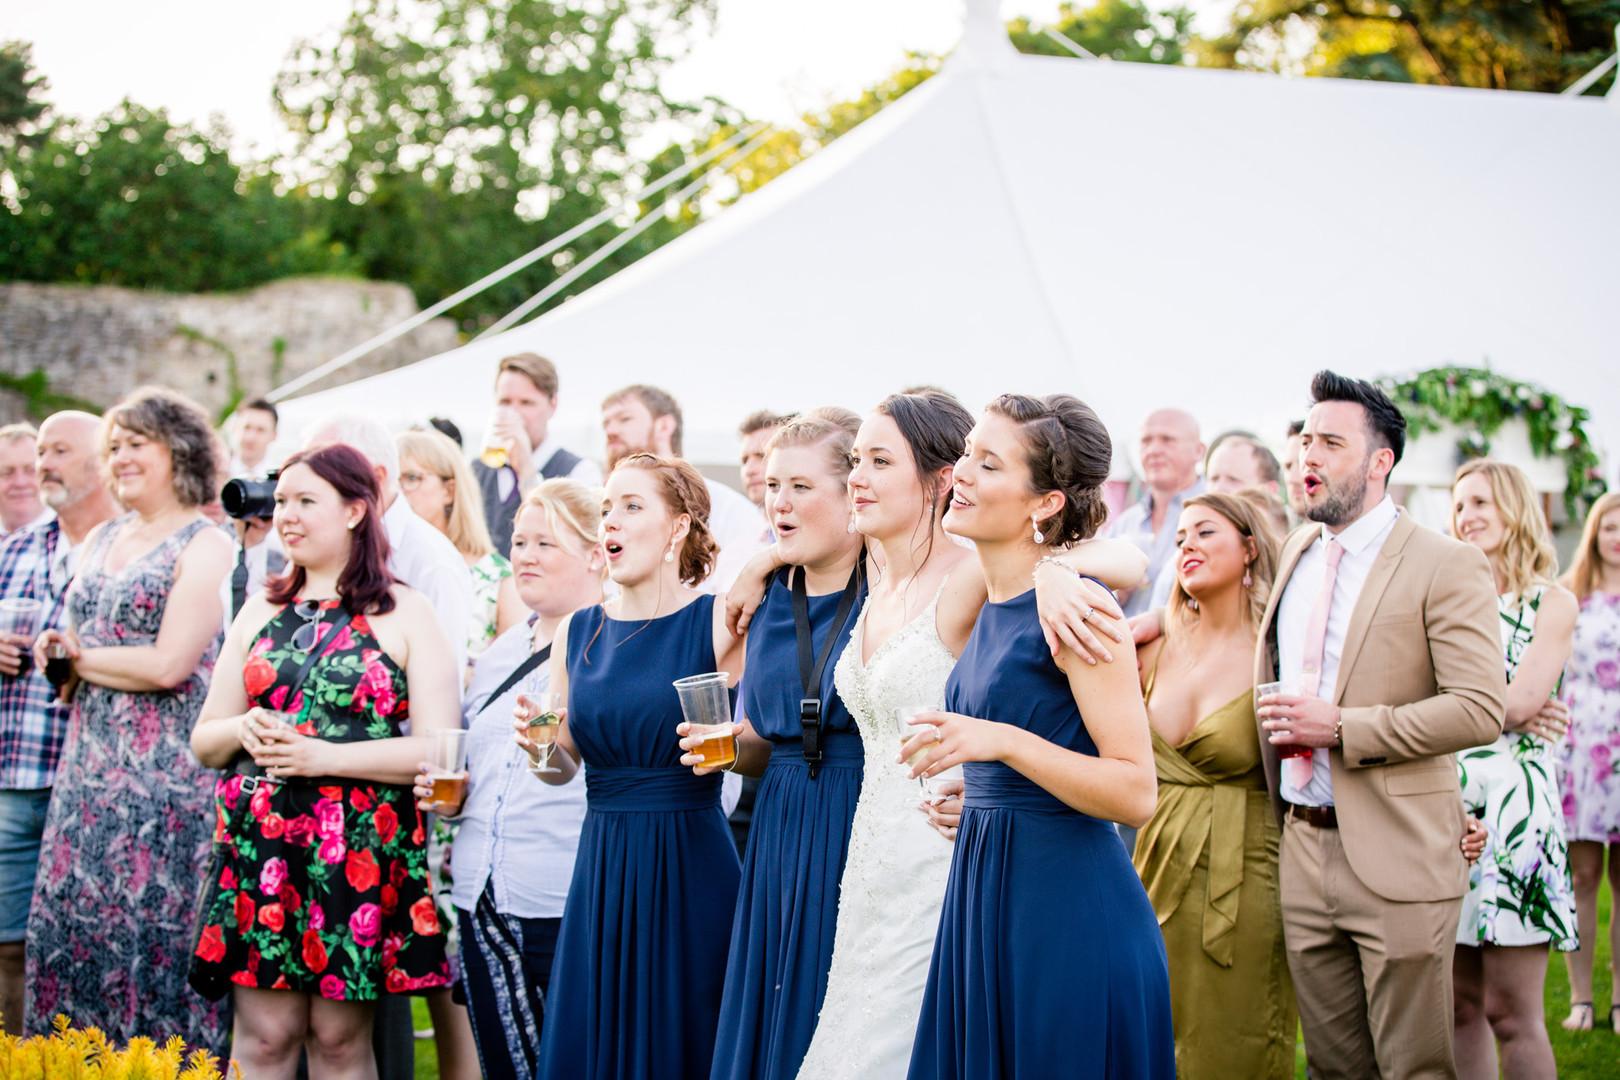 south-wales-wedding-photographer-7.jpg